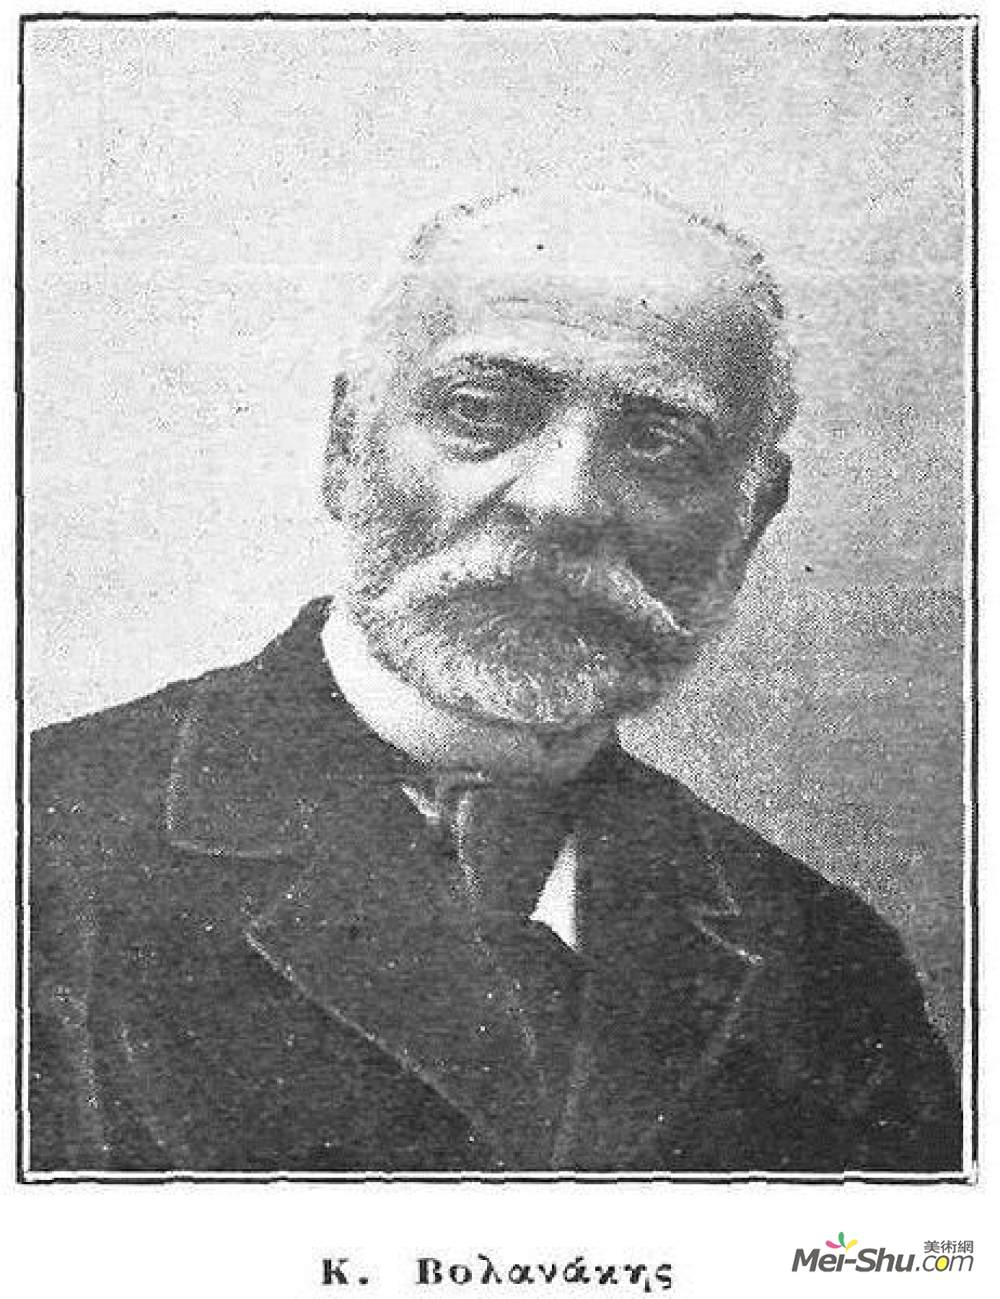 volanakis康斯坦丁(Konstantinos Volanakis)